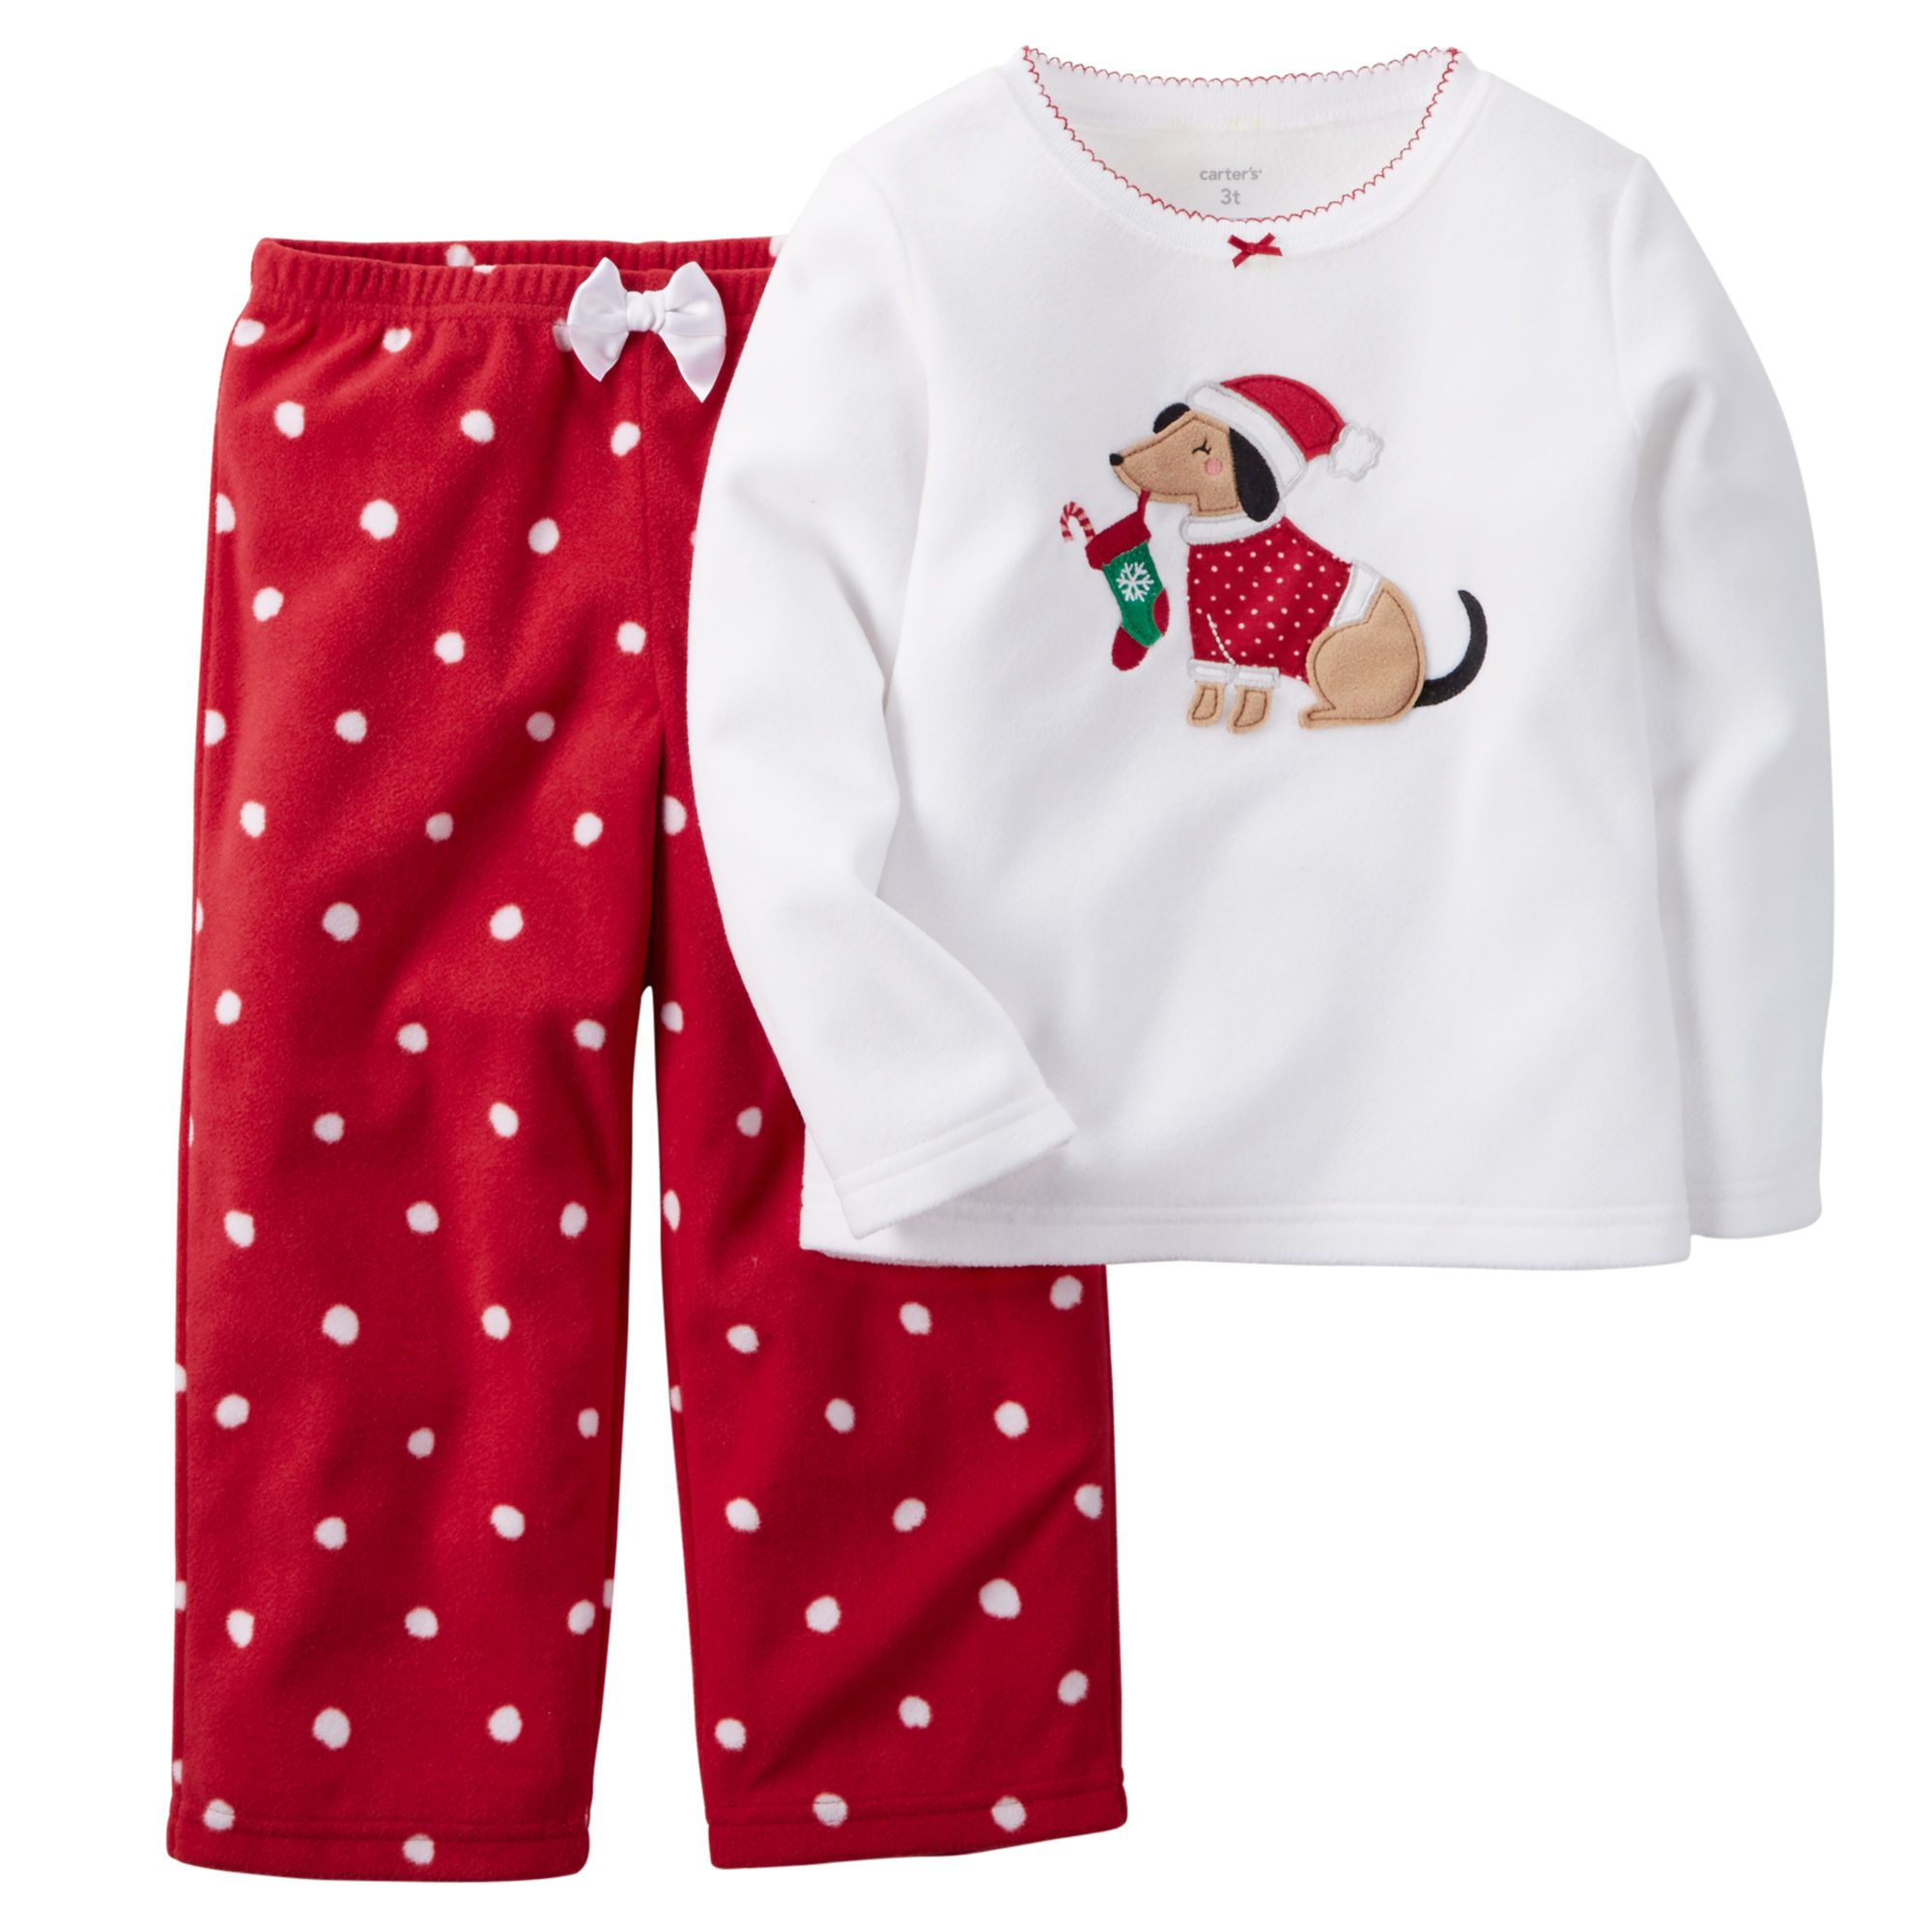 8b51a4691 2-Piece Fleece PJs